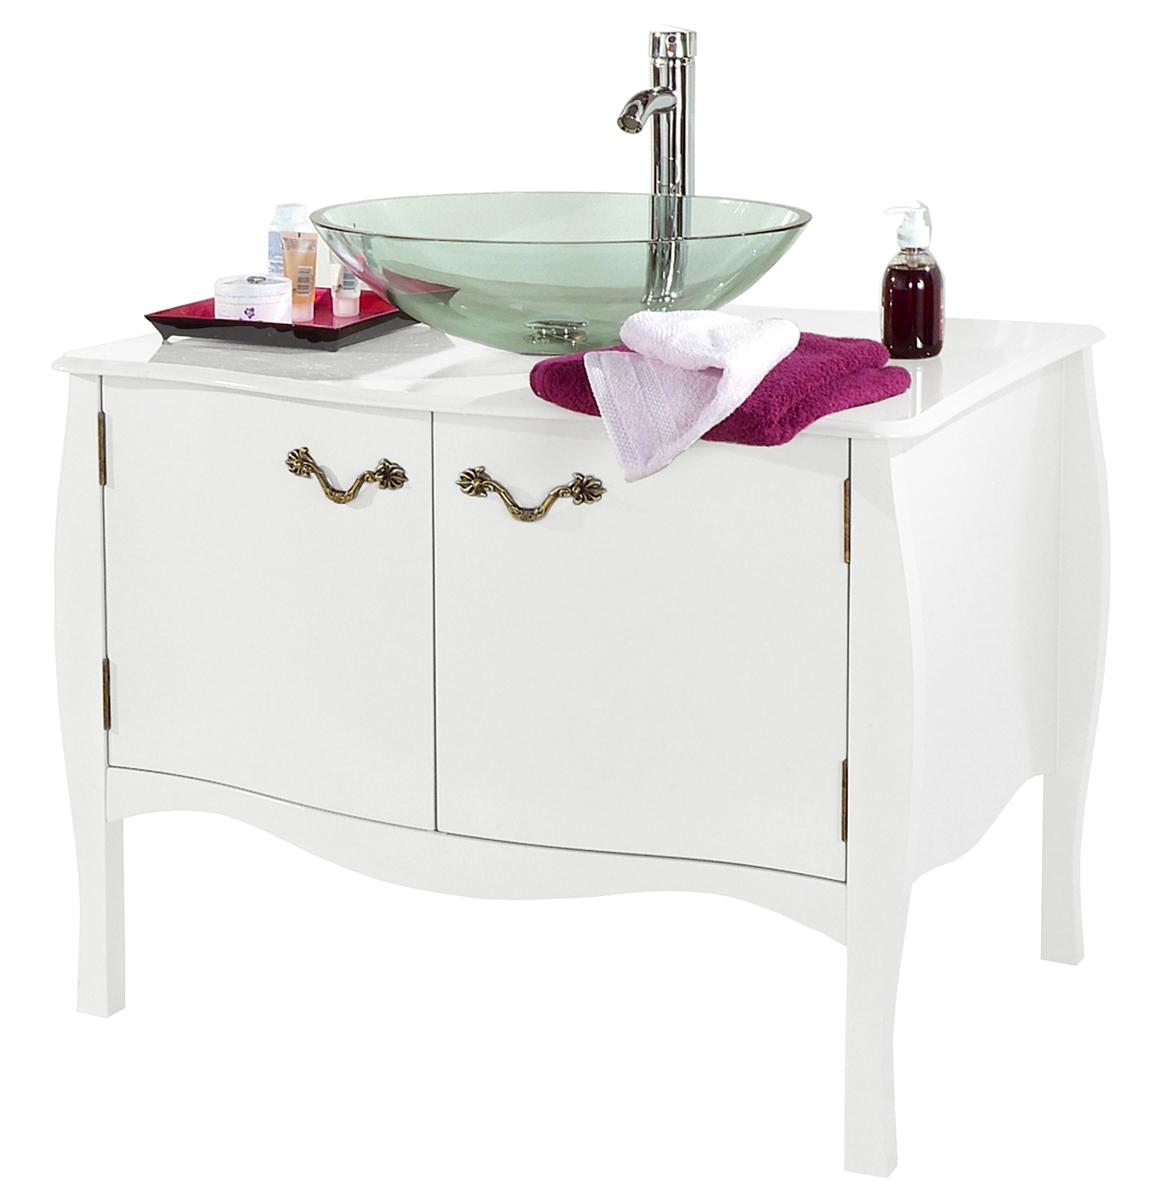 Creer Rangement Salle De Bain meuble de salle de bain diy